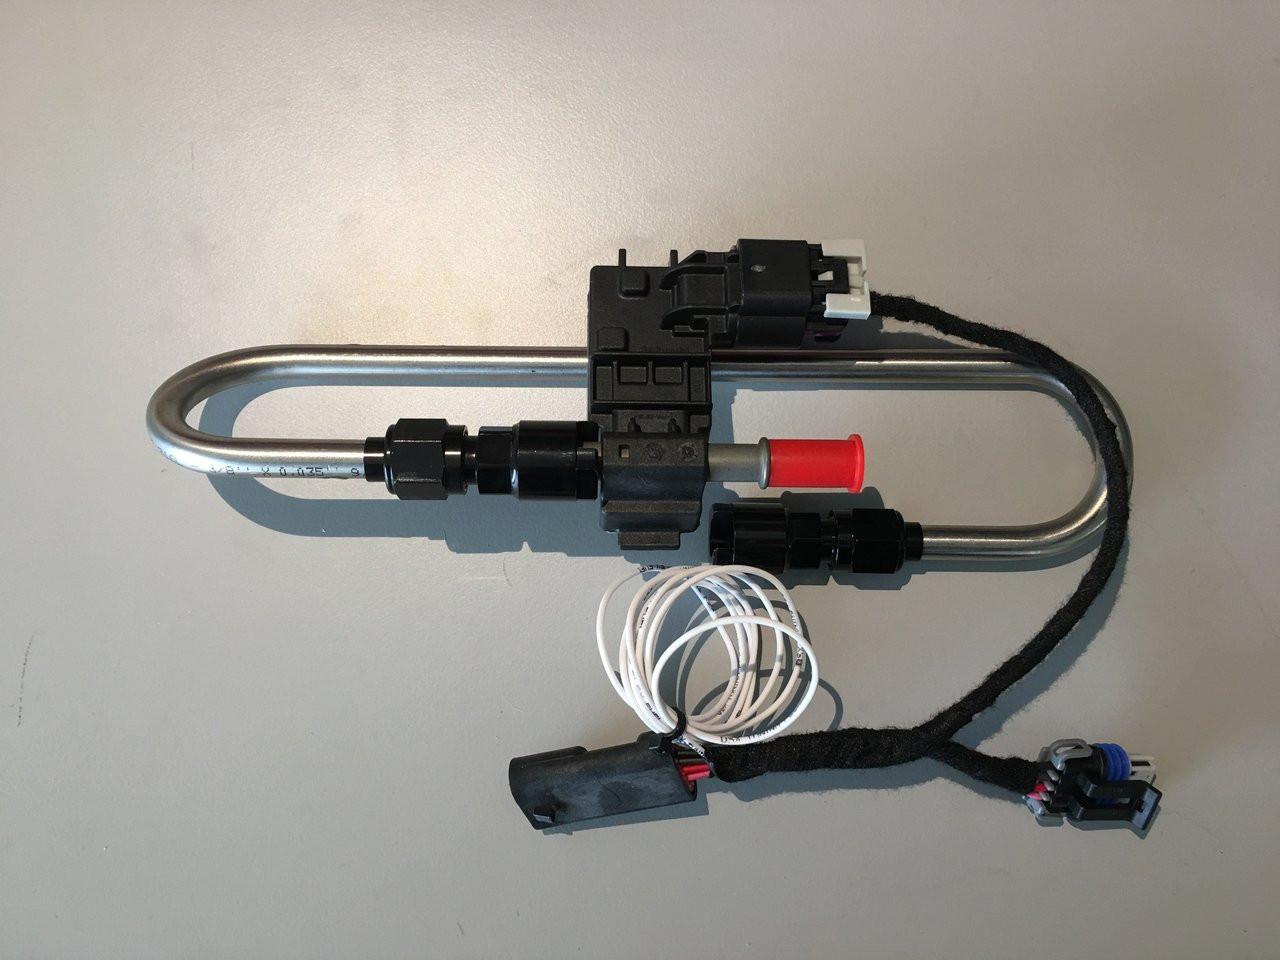 small resolution of dsx tuning flex fuel e85 kit 2012 2015 chevy camaro zl1